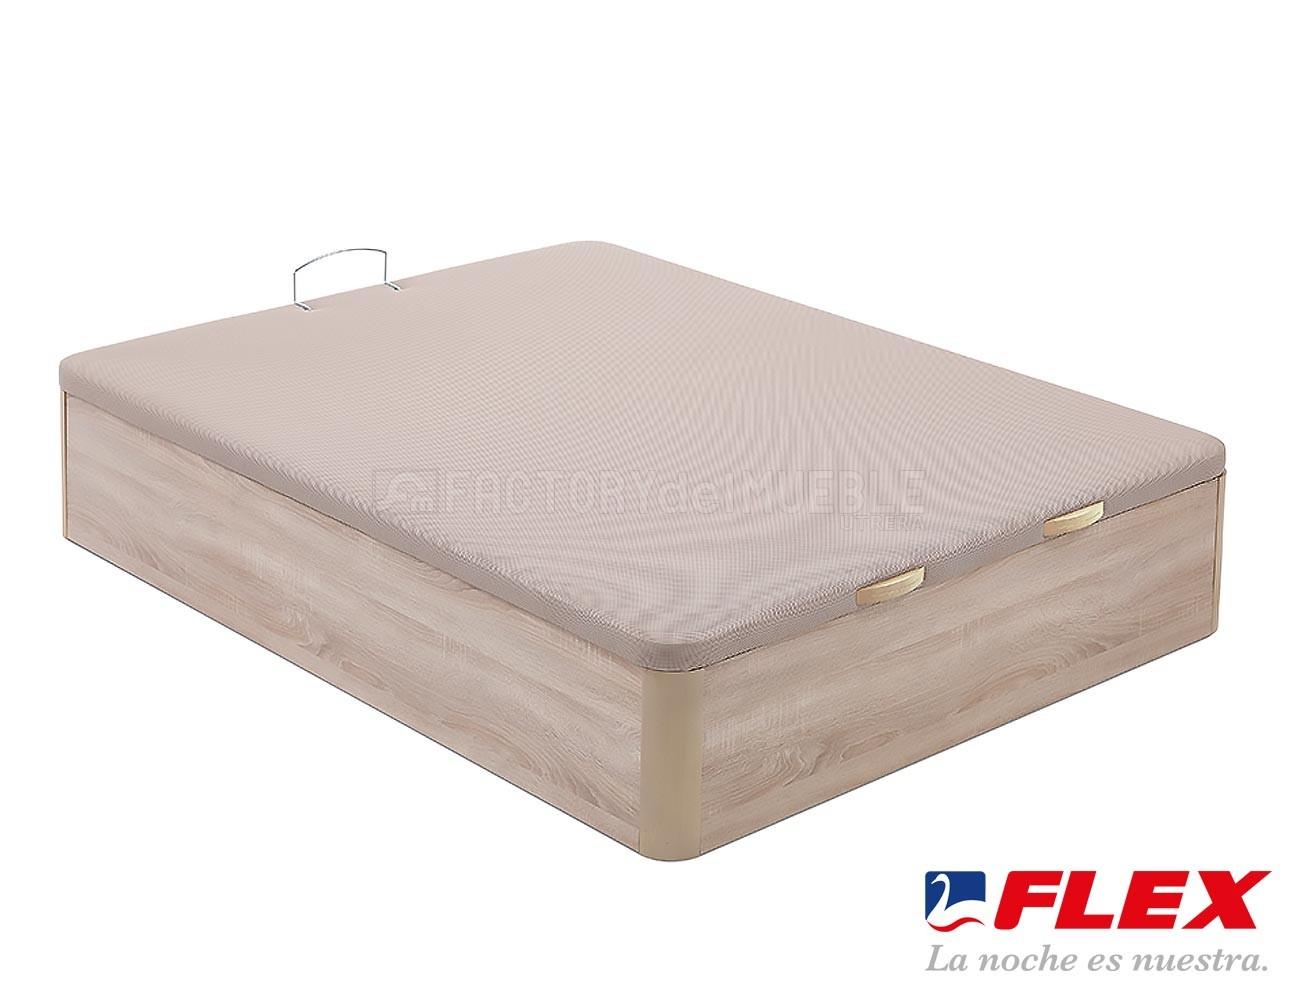 Canap flex abatible madera 7730 factory del mueble utrera for Canape 180x200